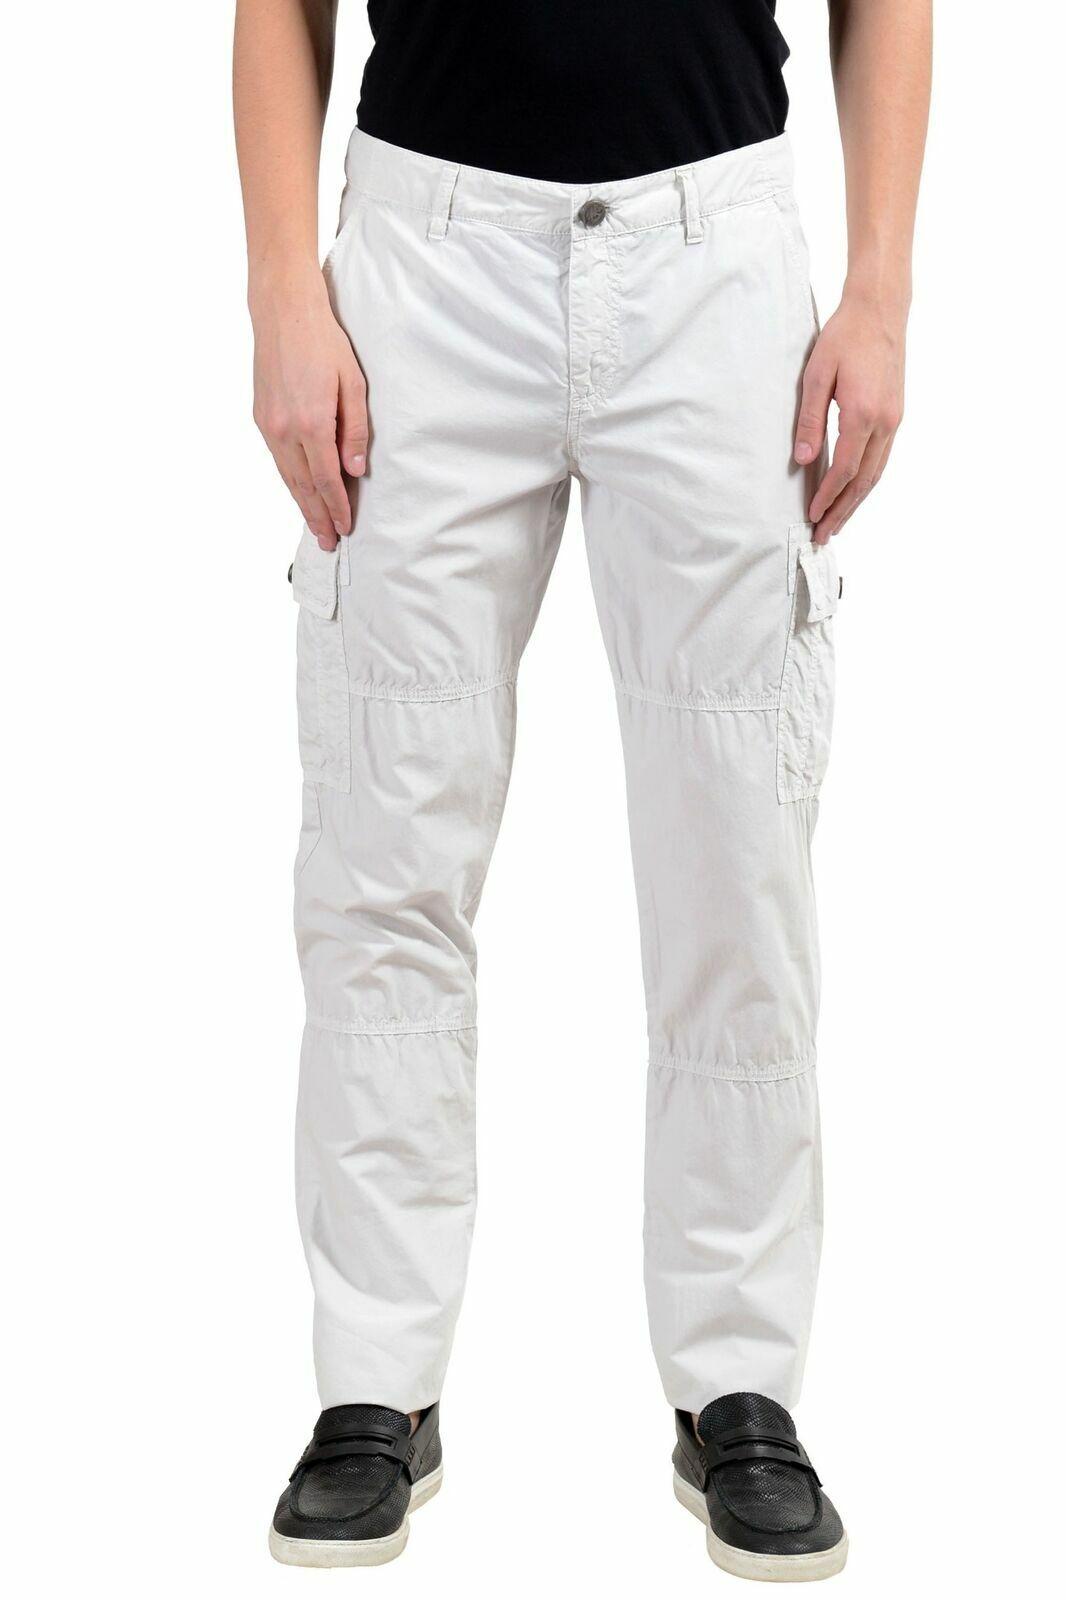 Versace Jeans men Avorio Pantaloni Militari USA 32